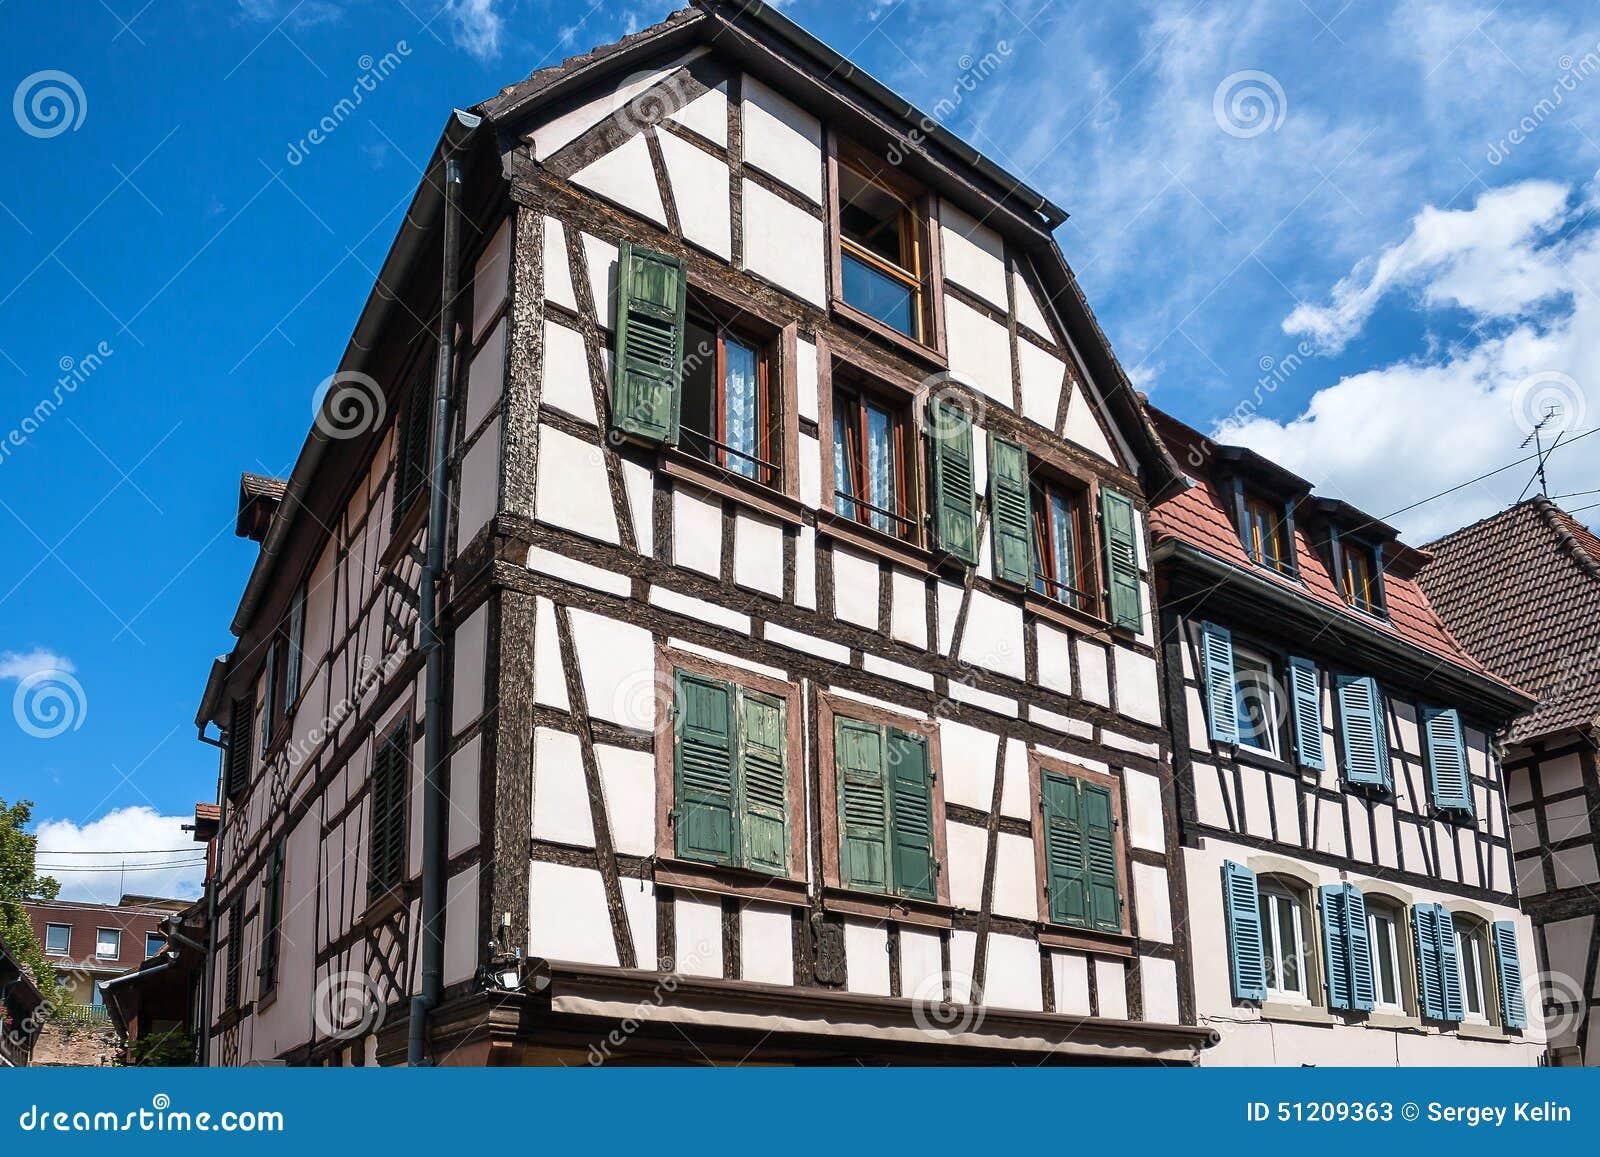 Arquitectura de entramado de madera tradicional en obernai for Arquitectura de madera